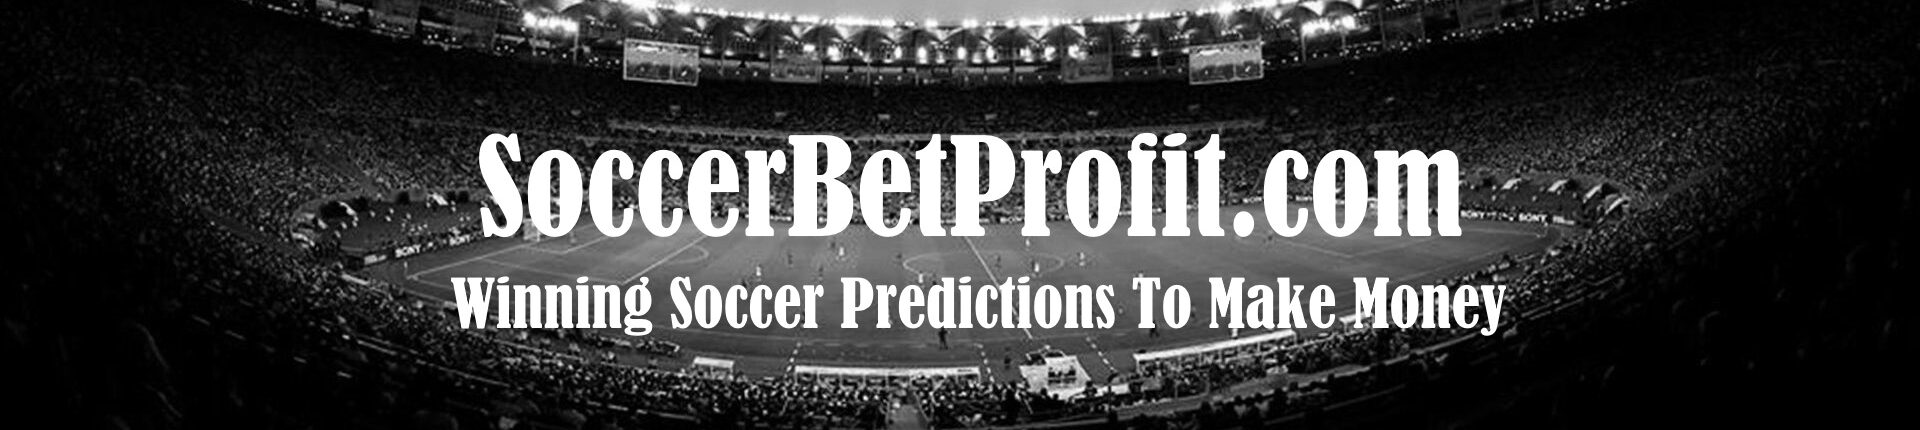 Soccer Bet Profit